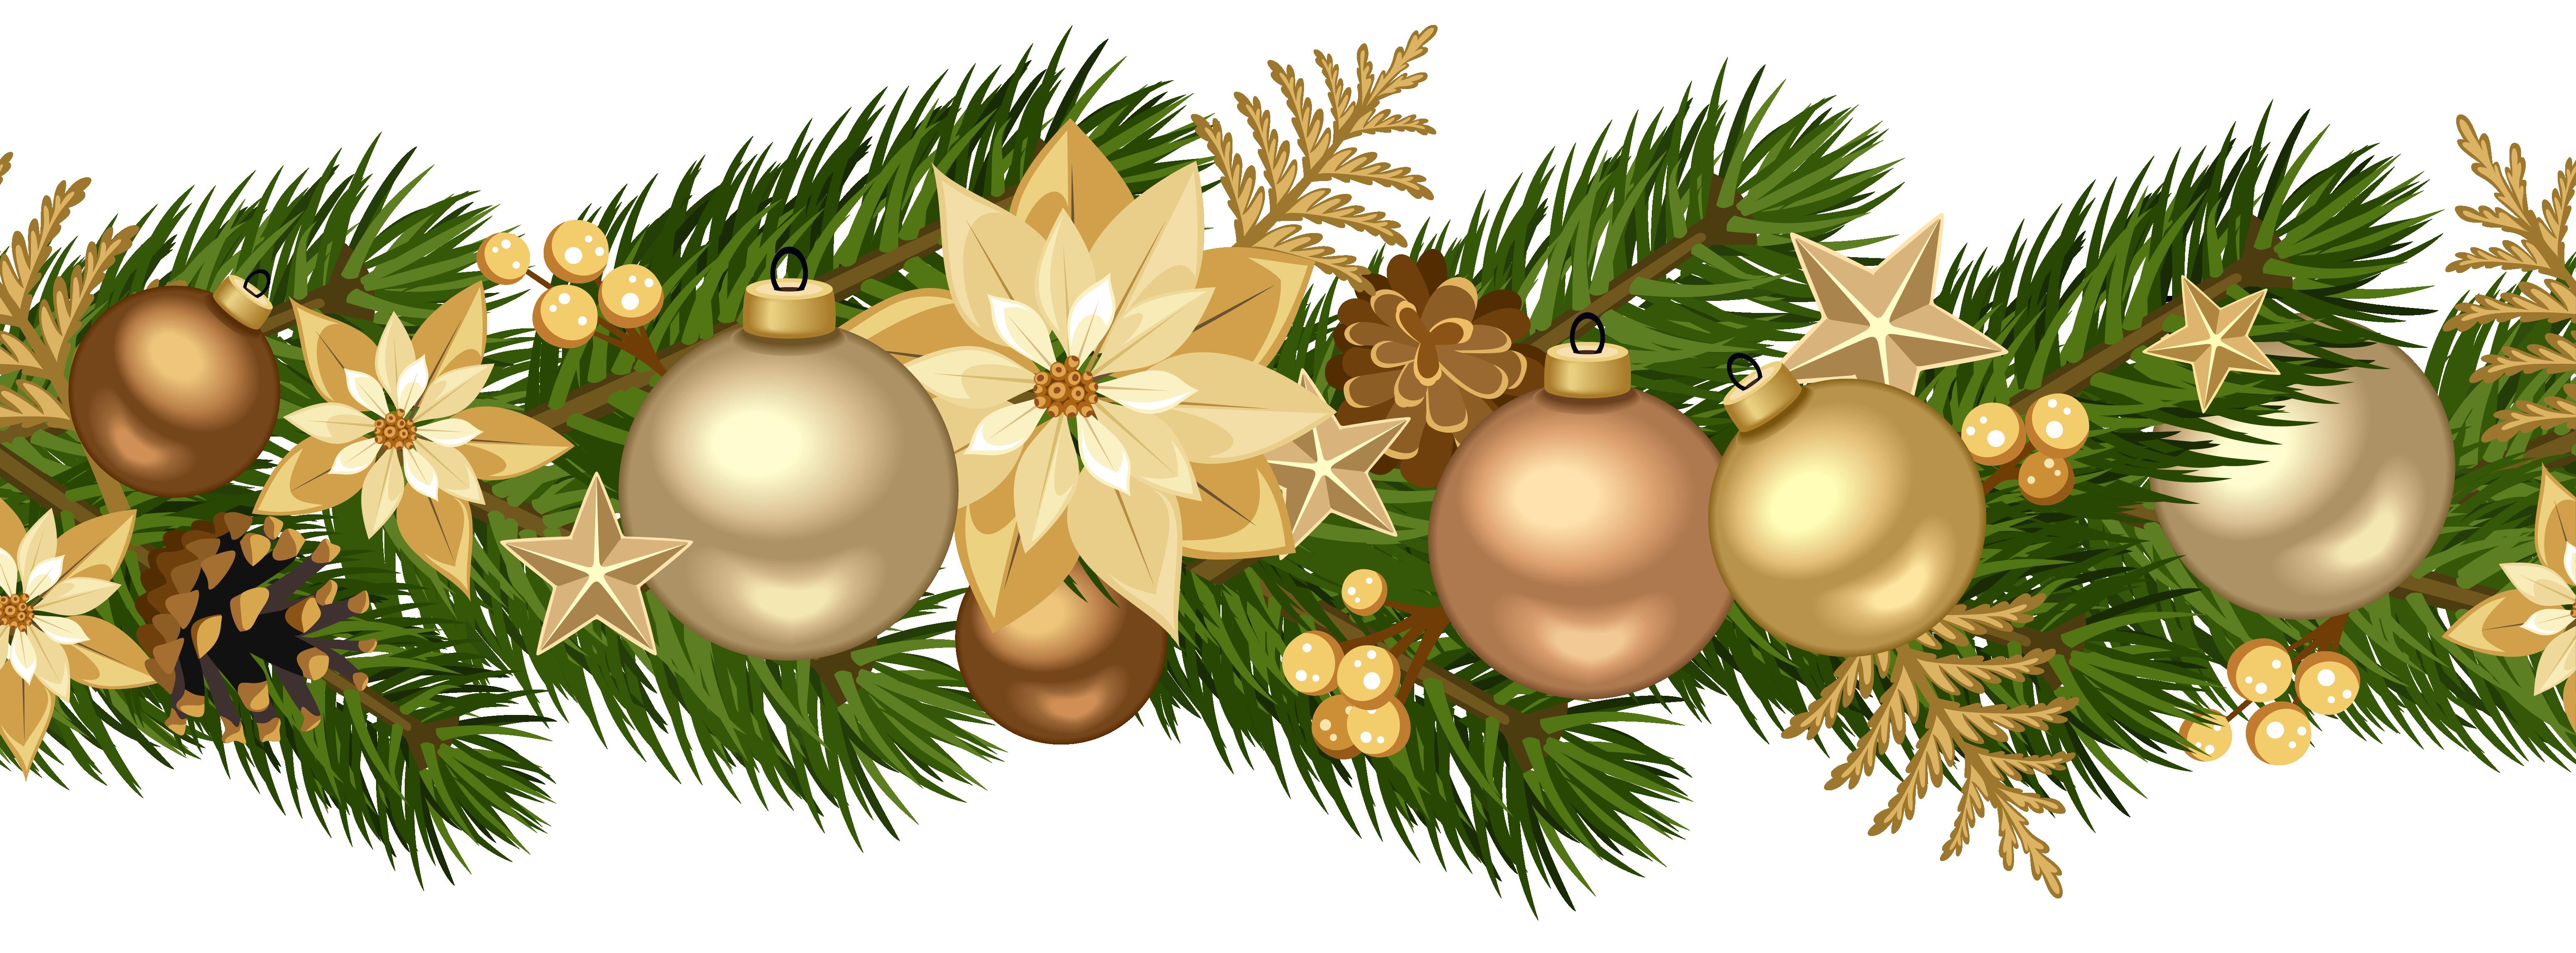 Decorative golden clip art. Christmas garland border png